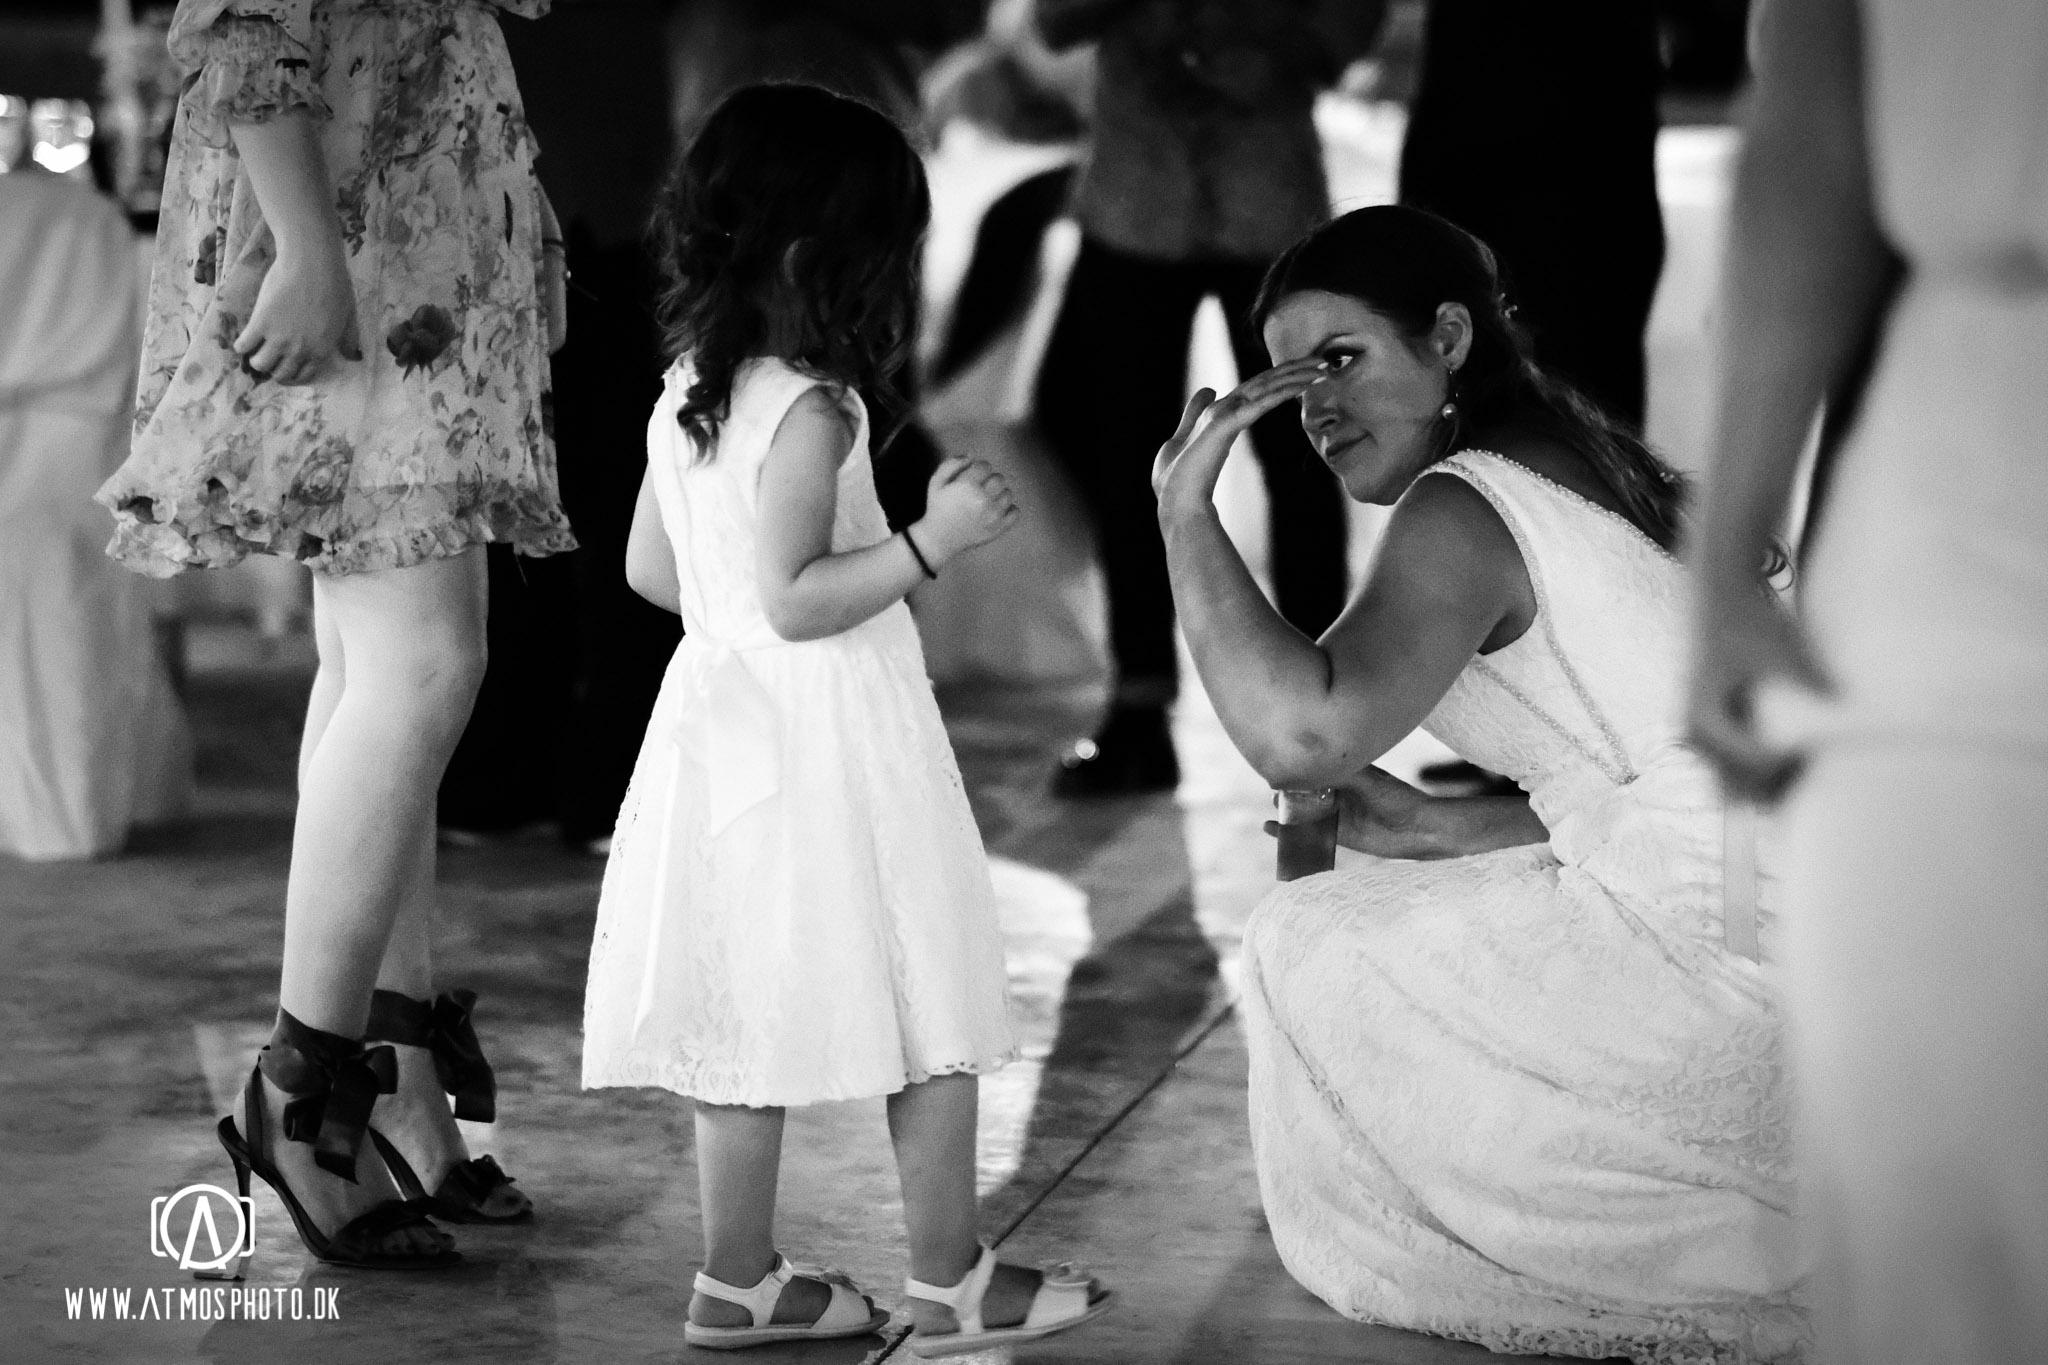 Wedding_AtmosPhoto_2048x-6-4.jpg